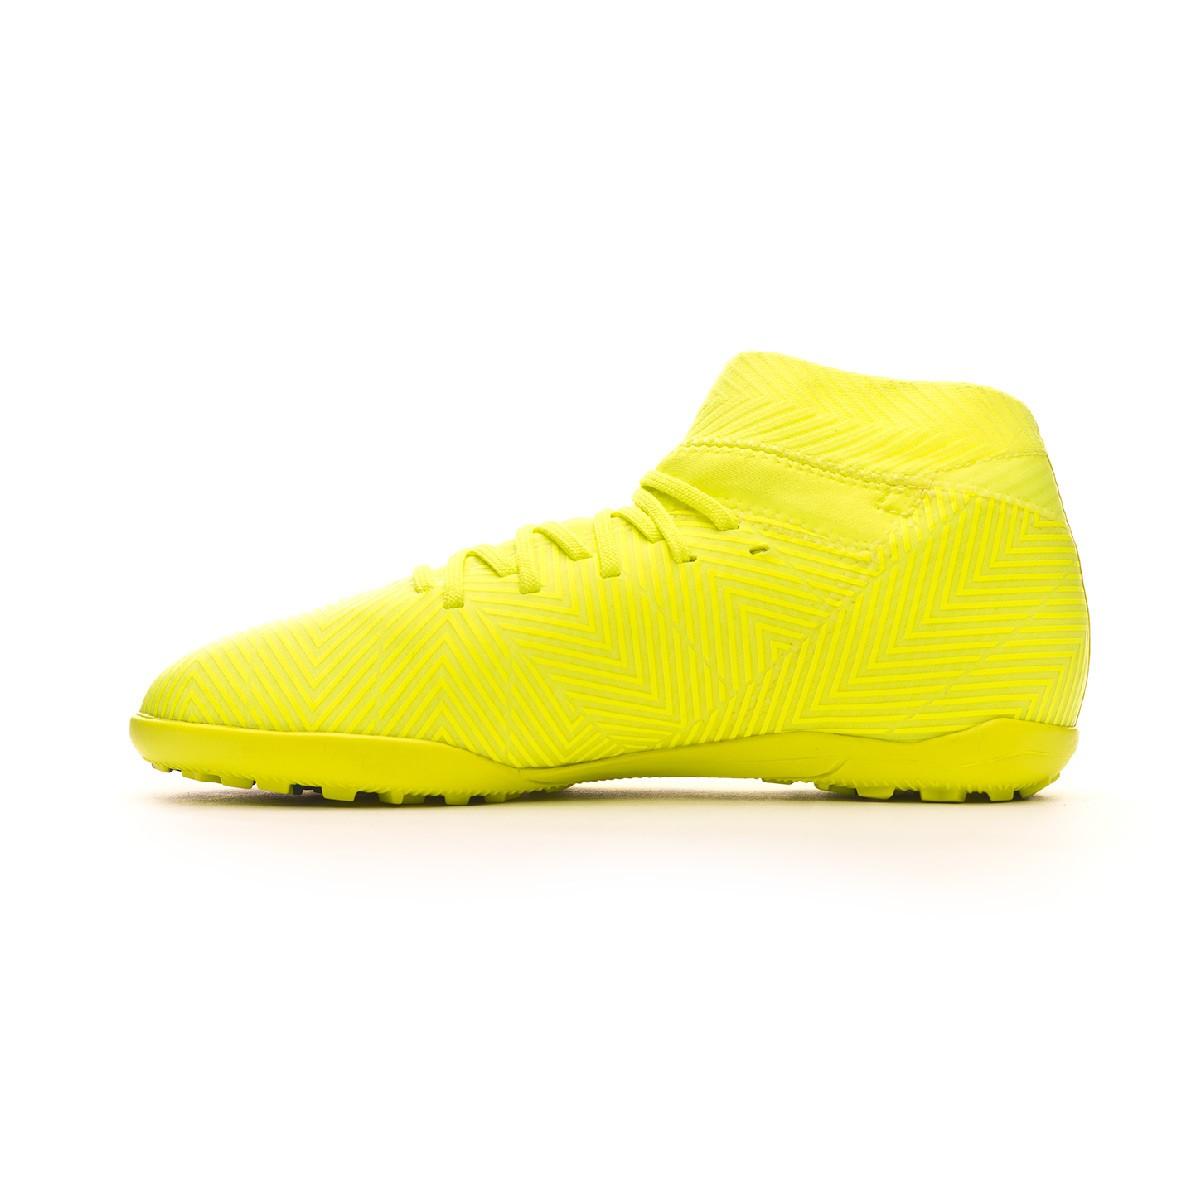 c837c9963ddc3 Tenis adidas Nemeziz Tango 18.3 Turf Niño Solar yellow-Football blue-Active  red - Tienda de fútbol Fútbol Emotion